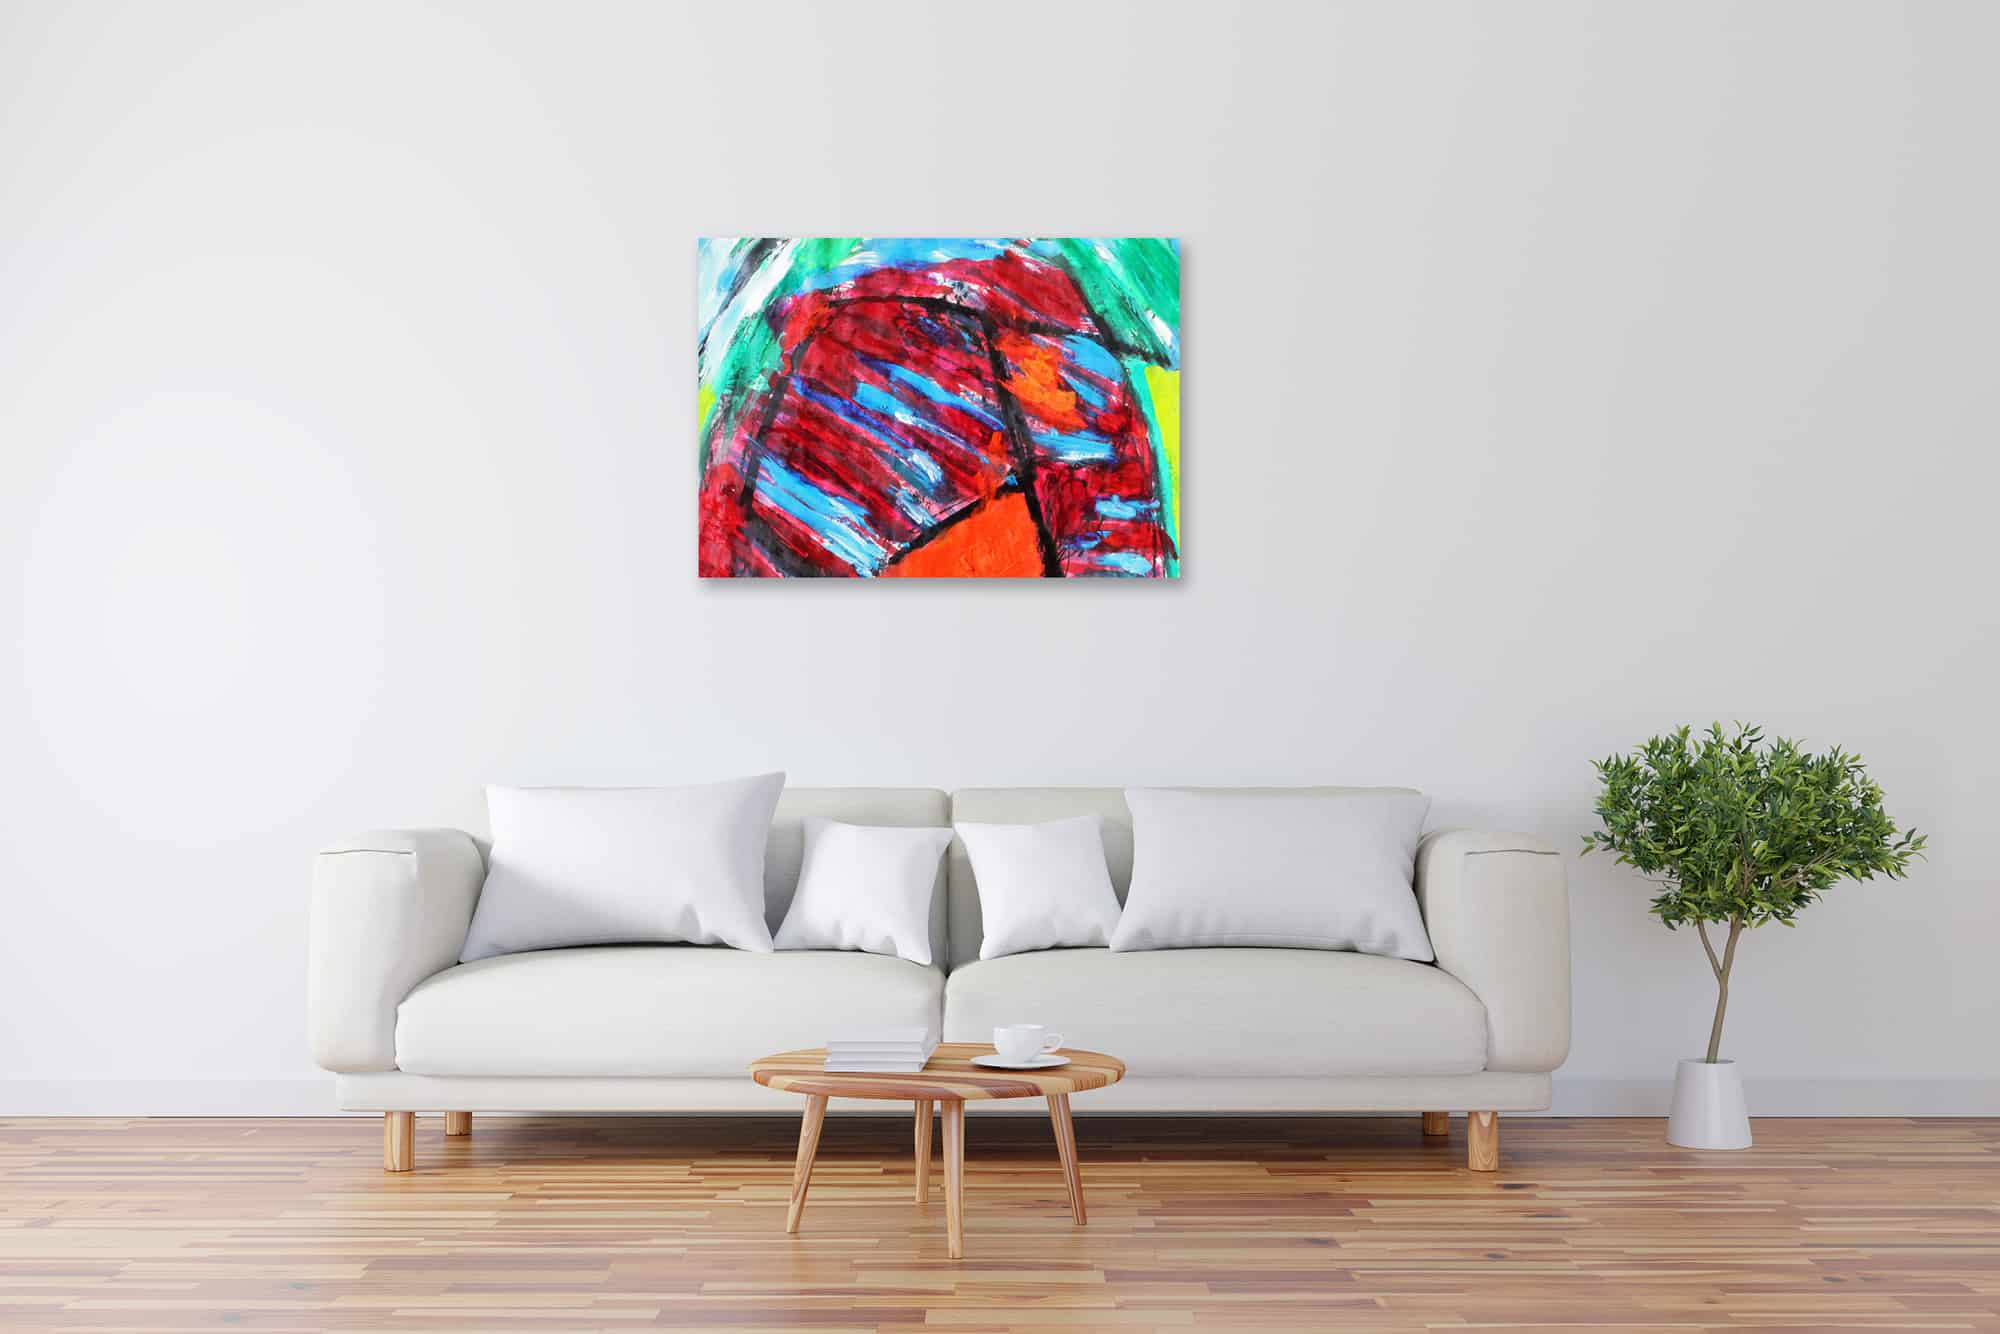 Acryl Gemälde Glück bild kaufen